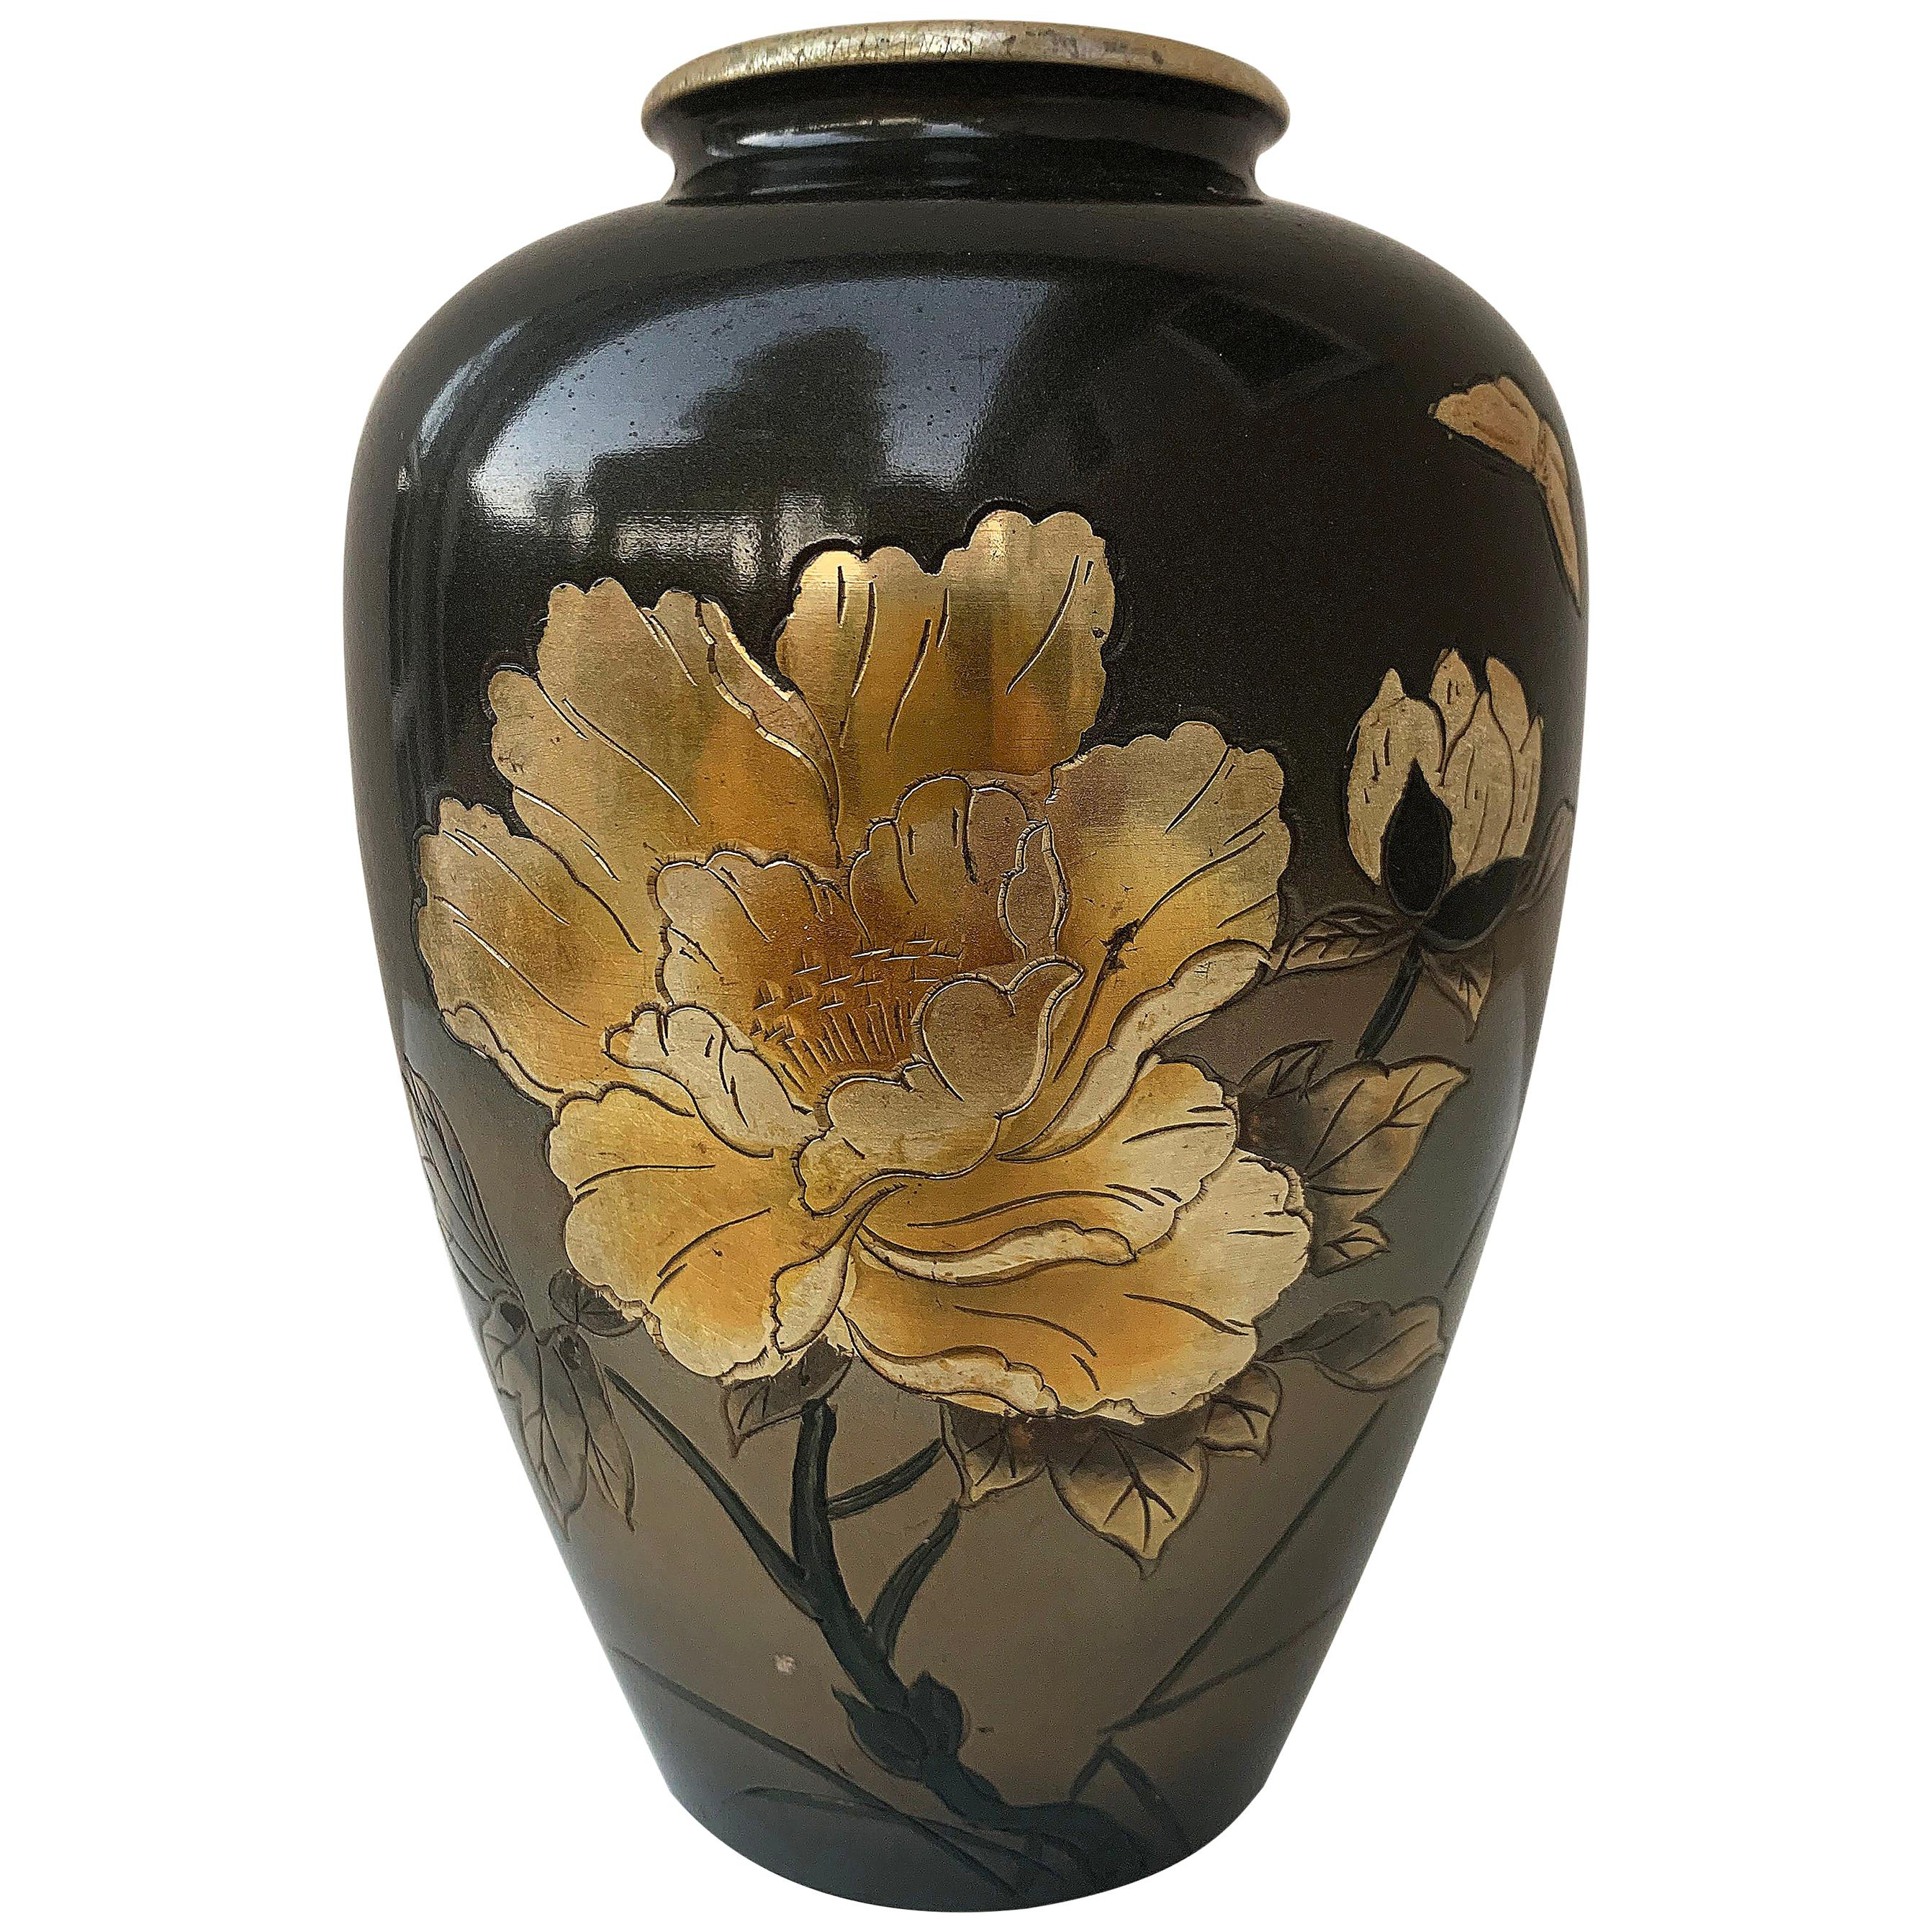 Japanese Brass Vase with Flower Motif